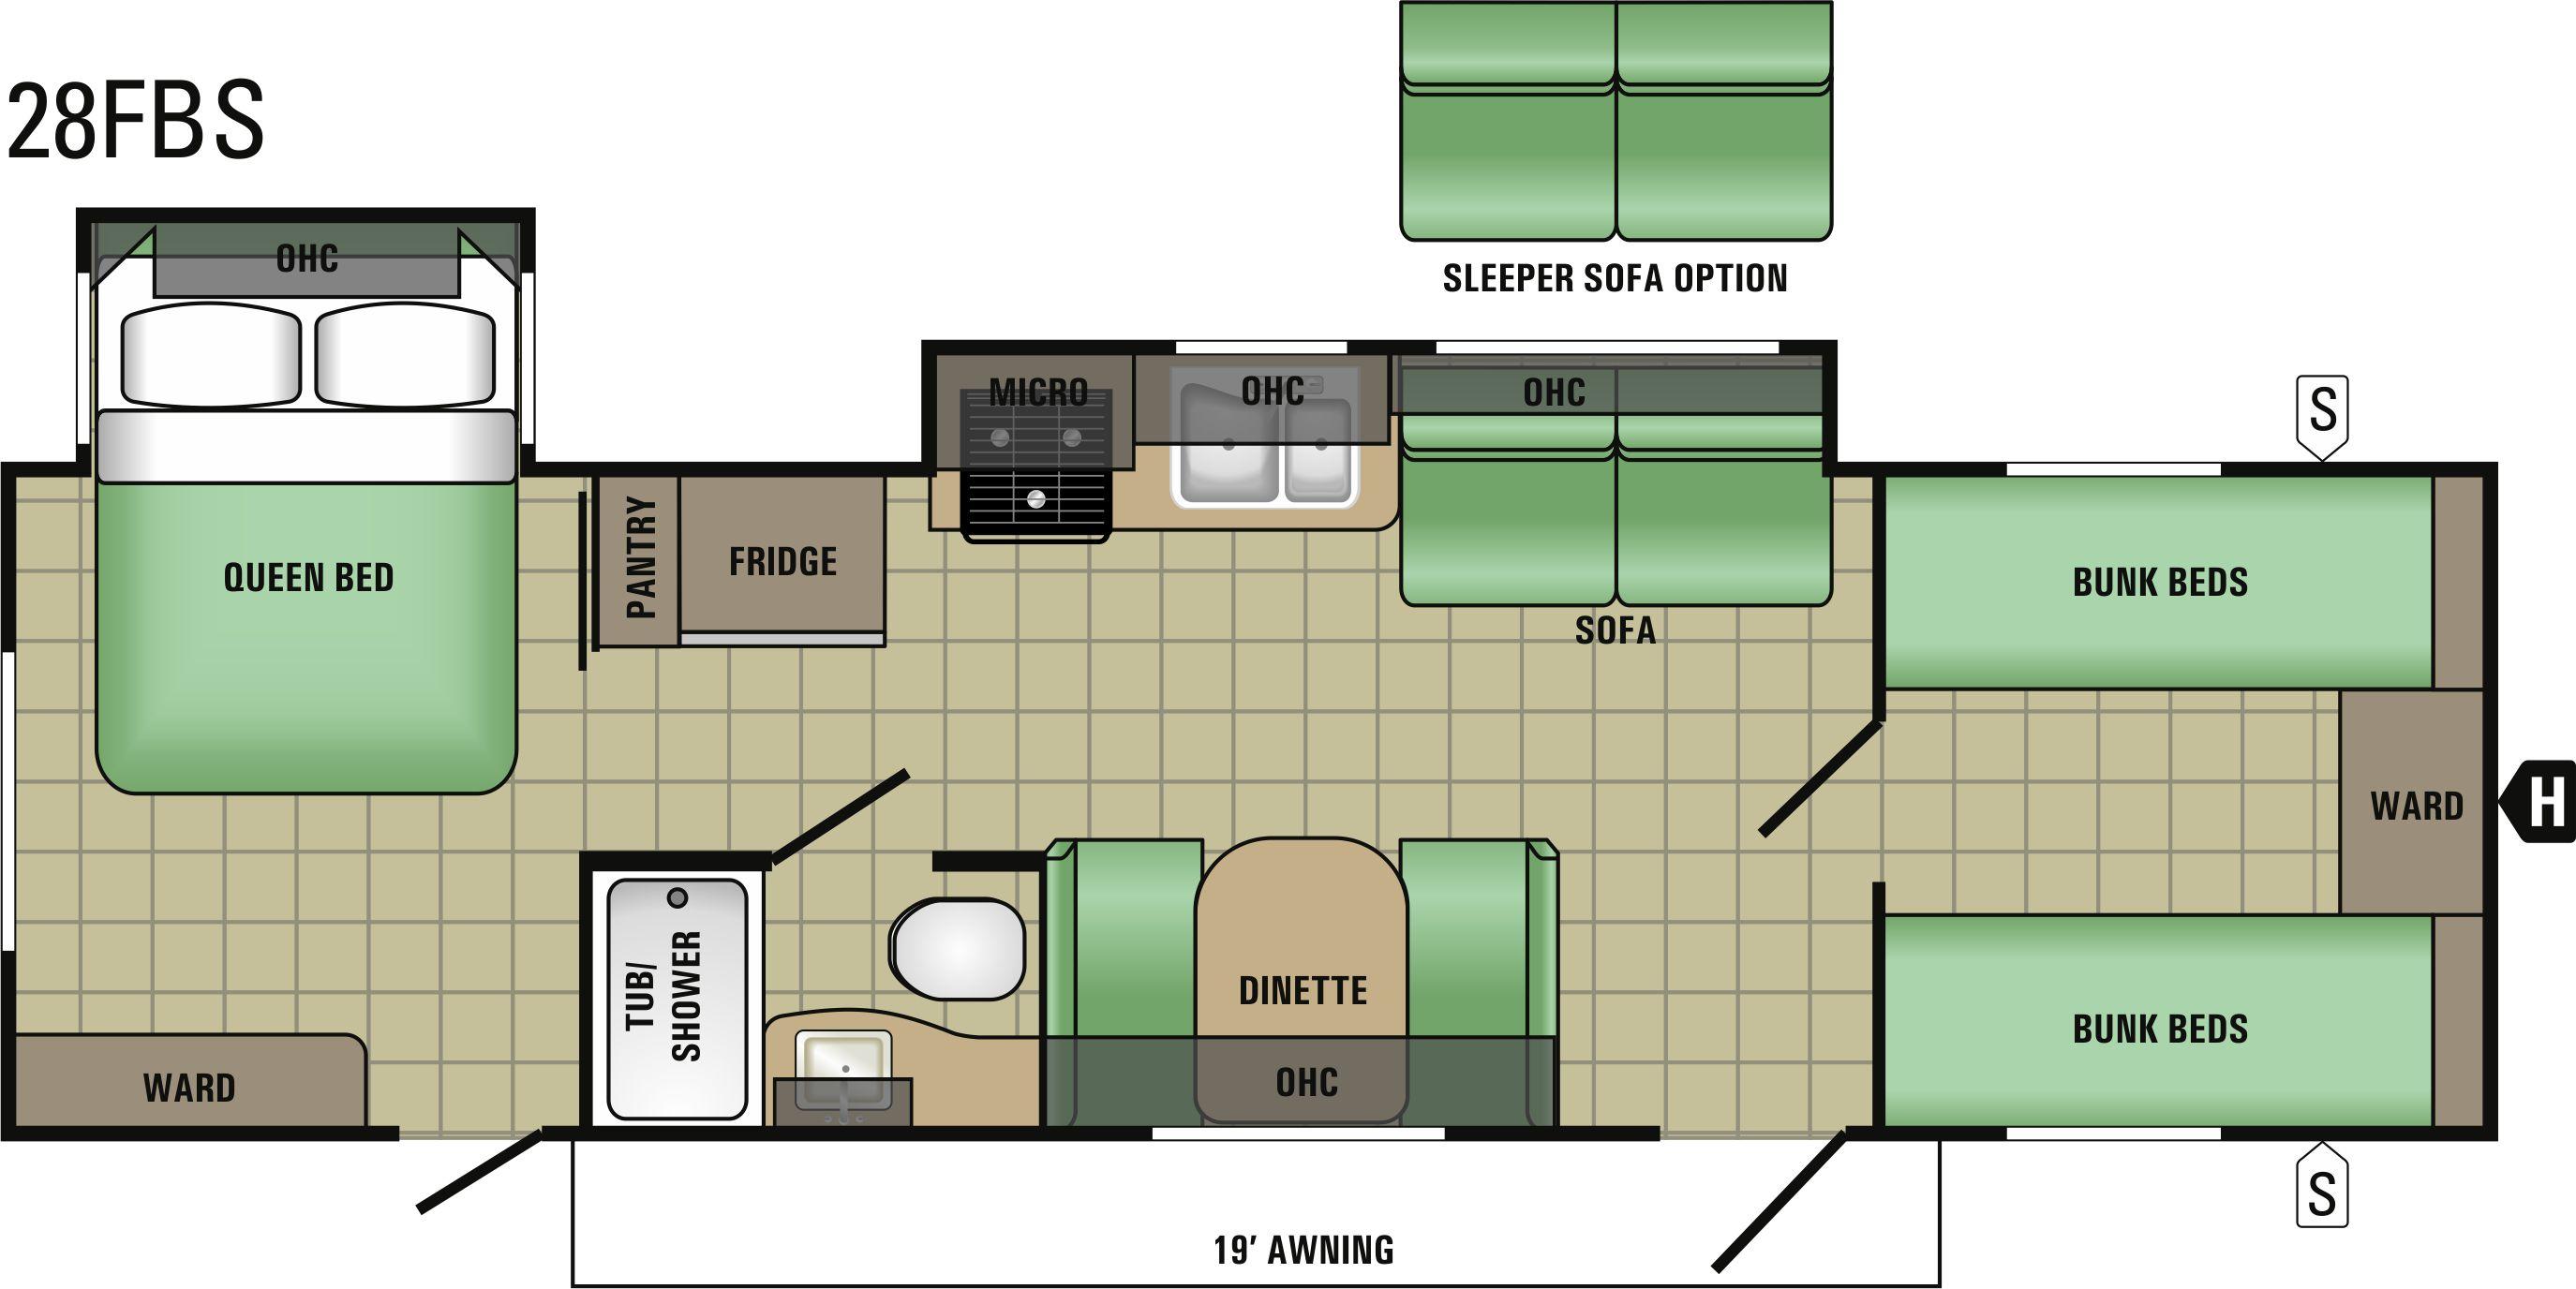 28FBS Floorplan